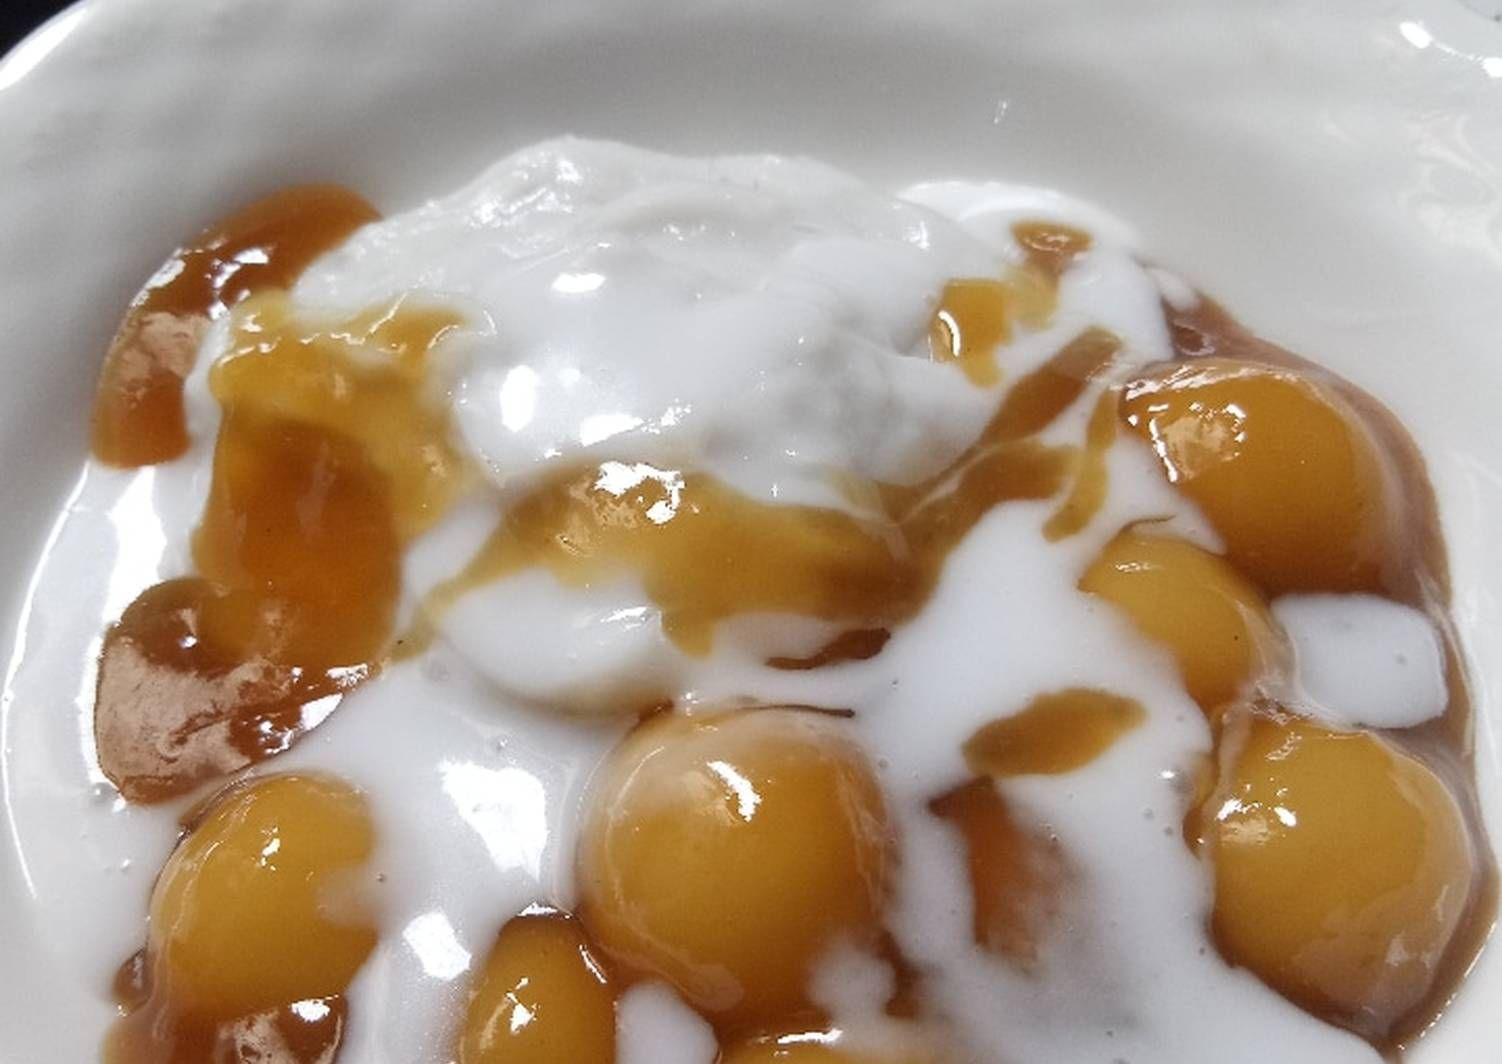 Resep Bubur Sumsum Candil Oleh Maylisha Resep Resep Makanan Dan Minuman Makanan